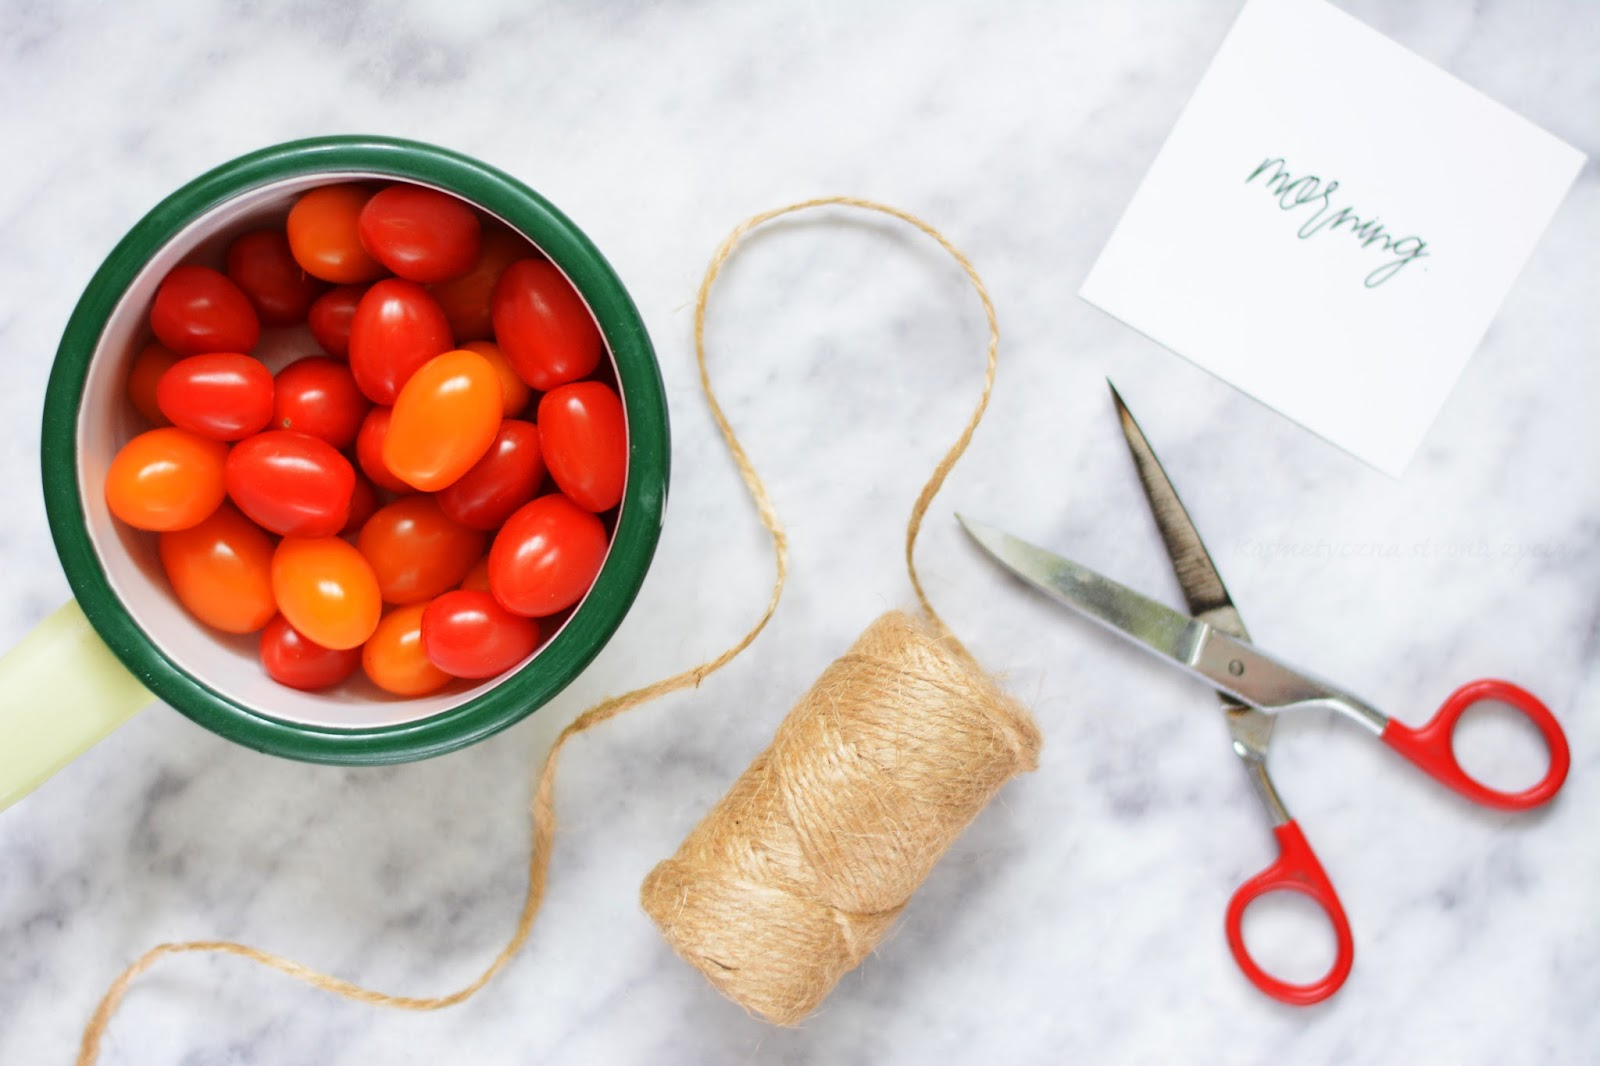 Plany wakacyjne - duka - pomidorki - love